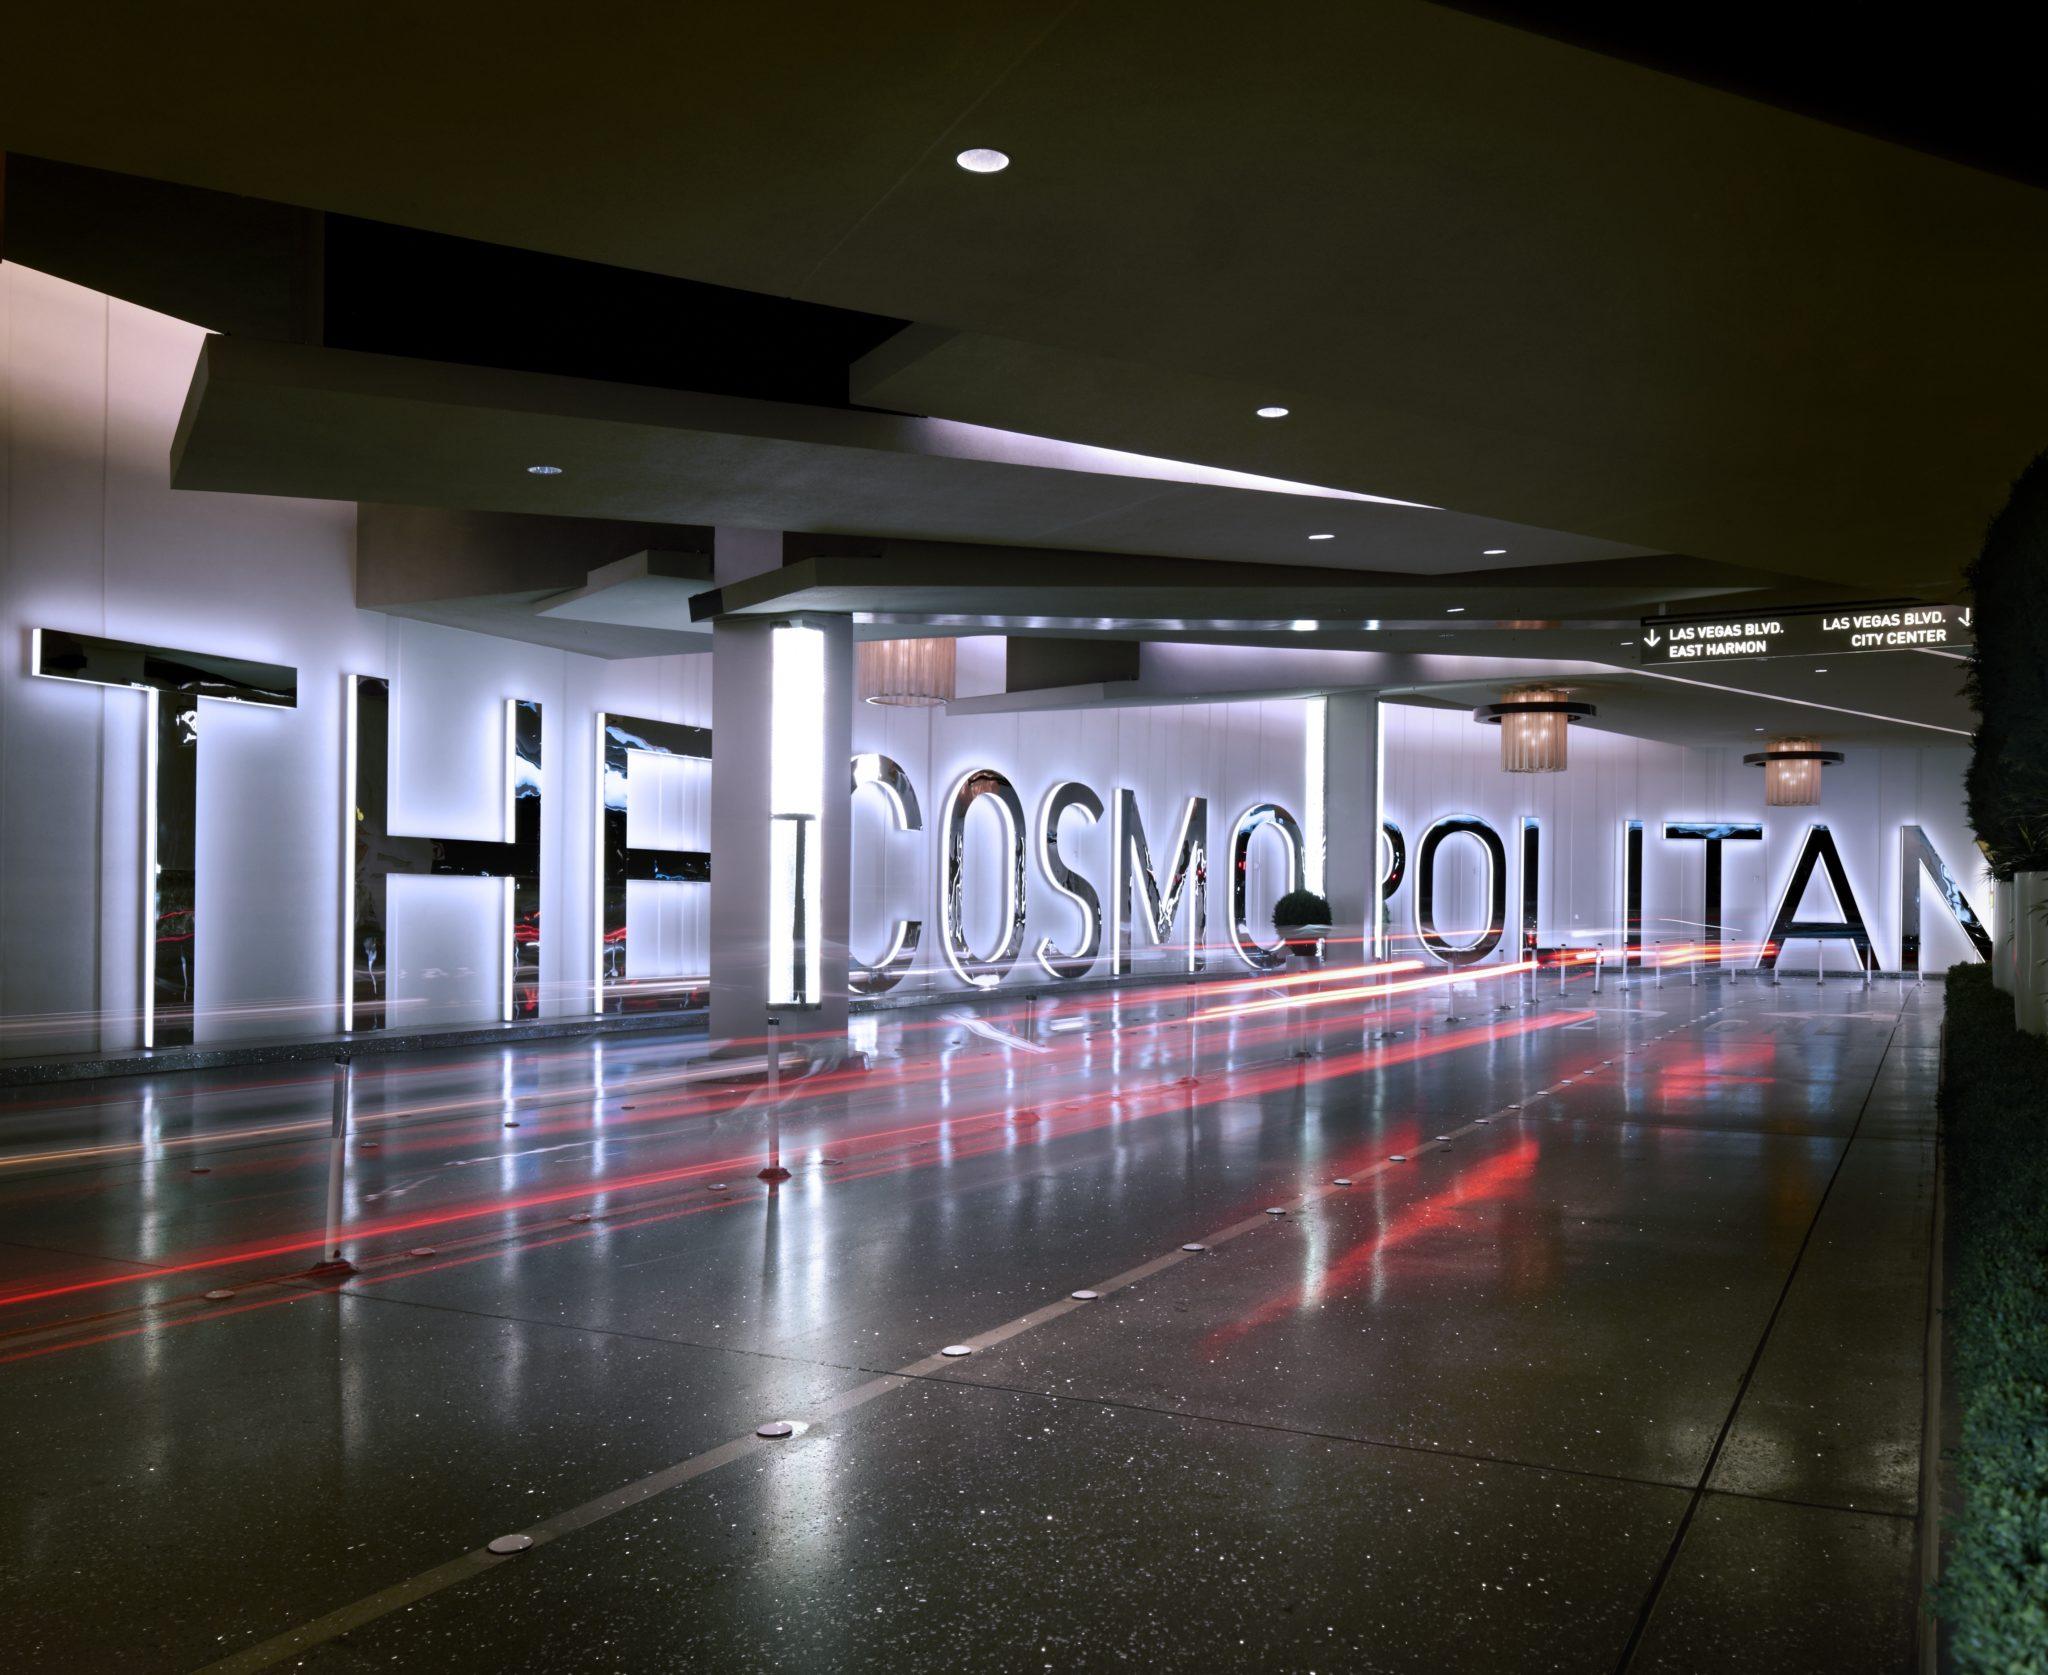 Porte cochere at The Cosmopolitan Las Vegas